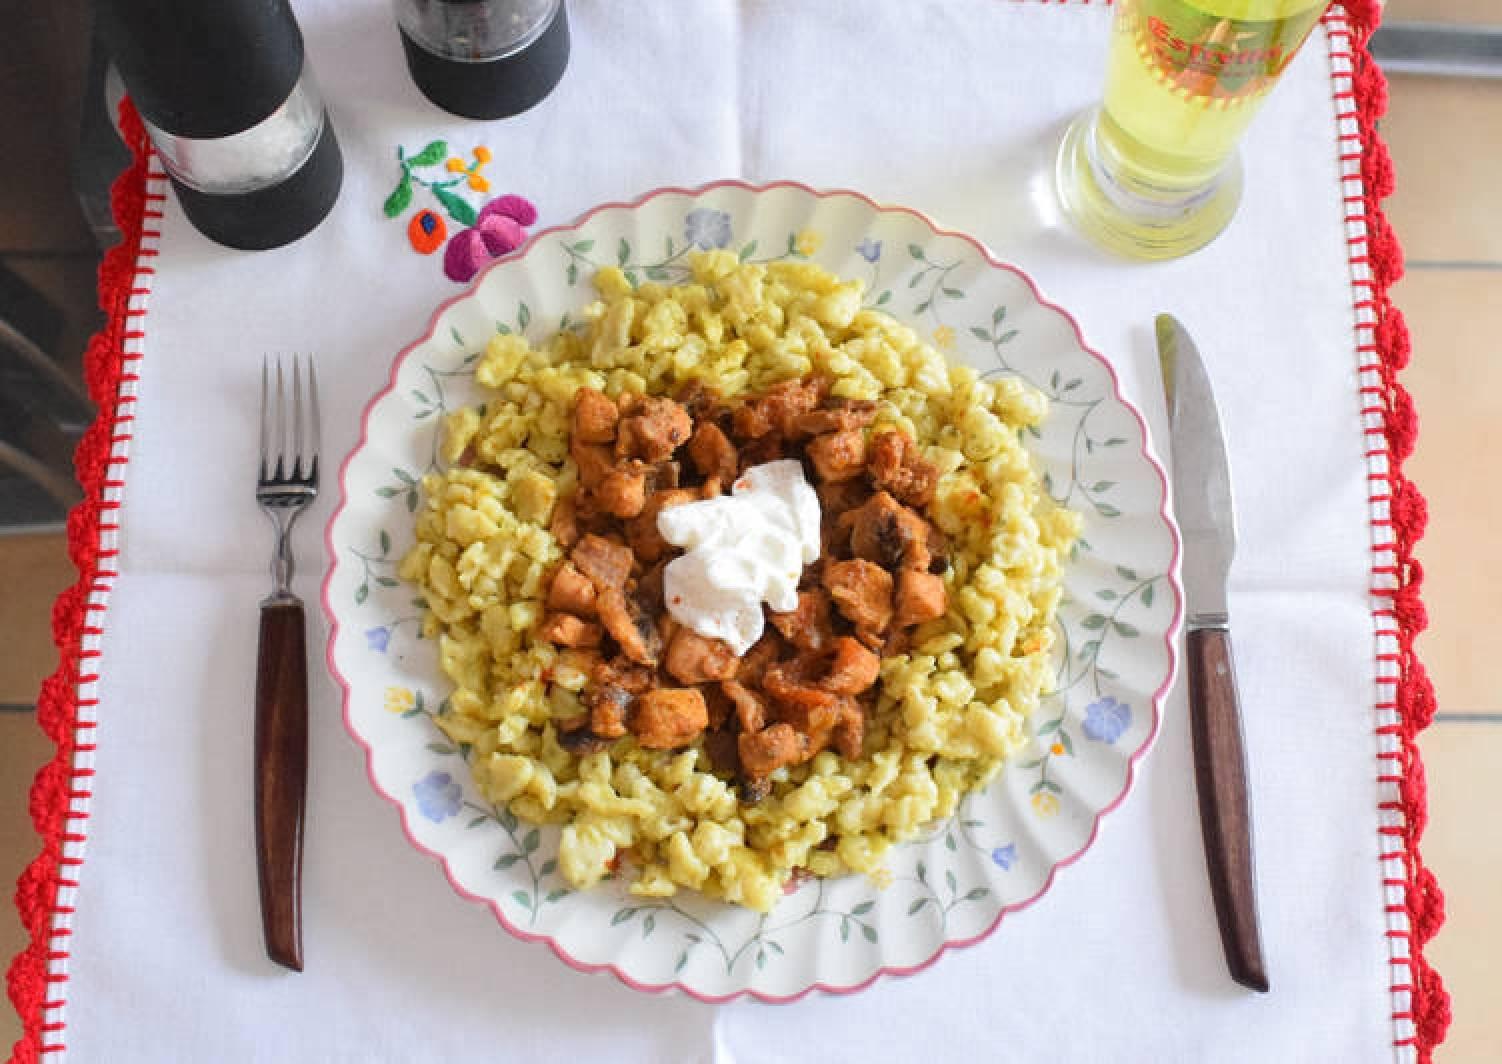 Chicken & mushroom paprikas with Hungarian dumplings